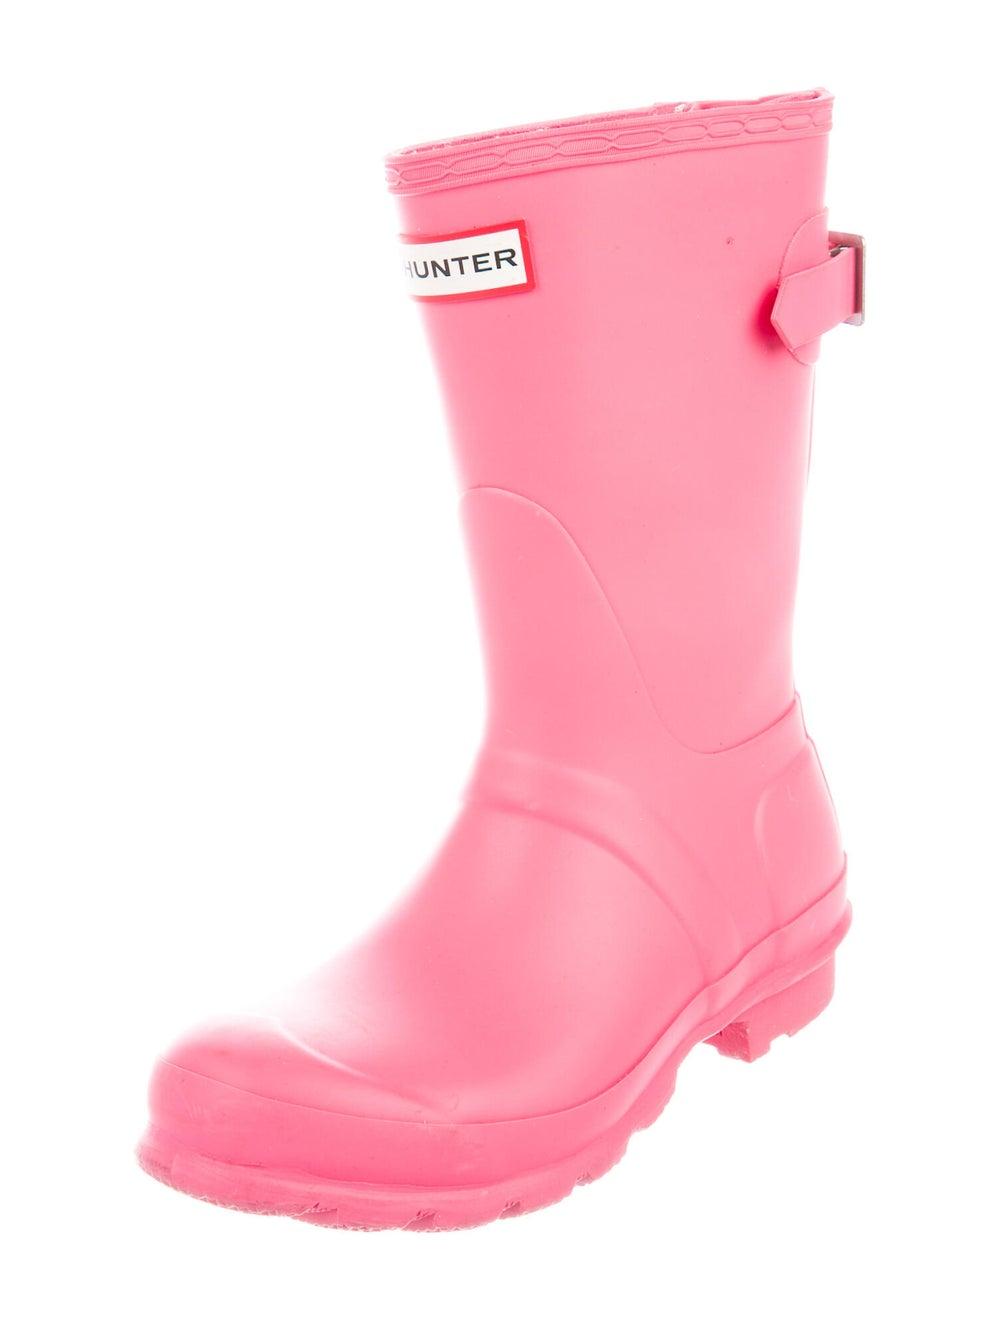 Hunter Rain Boots Pink - image 2